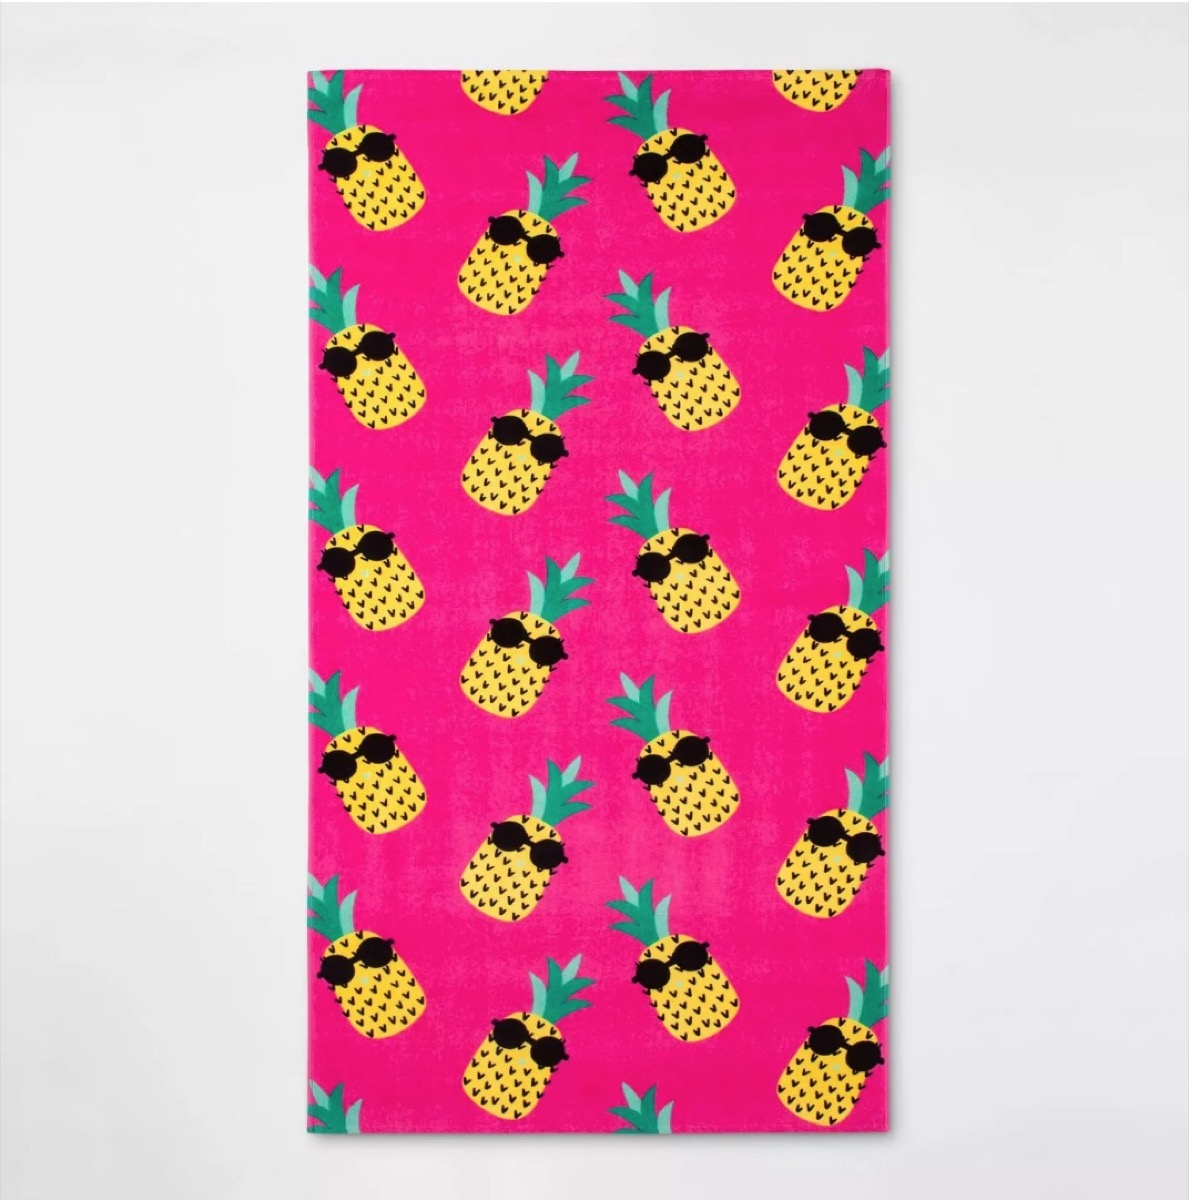 pineapple beach towel, target beach essentials